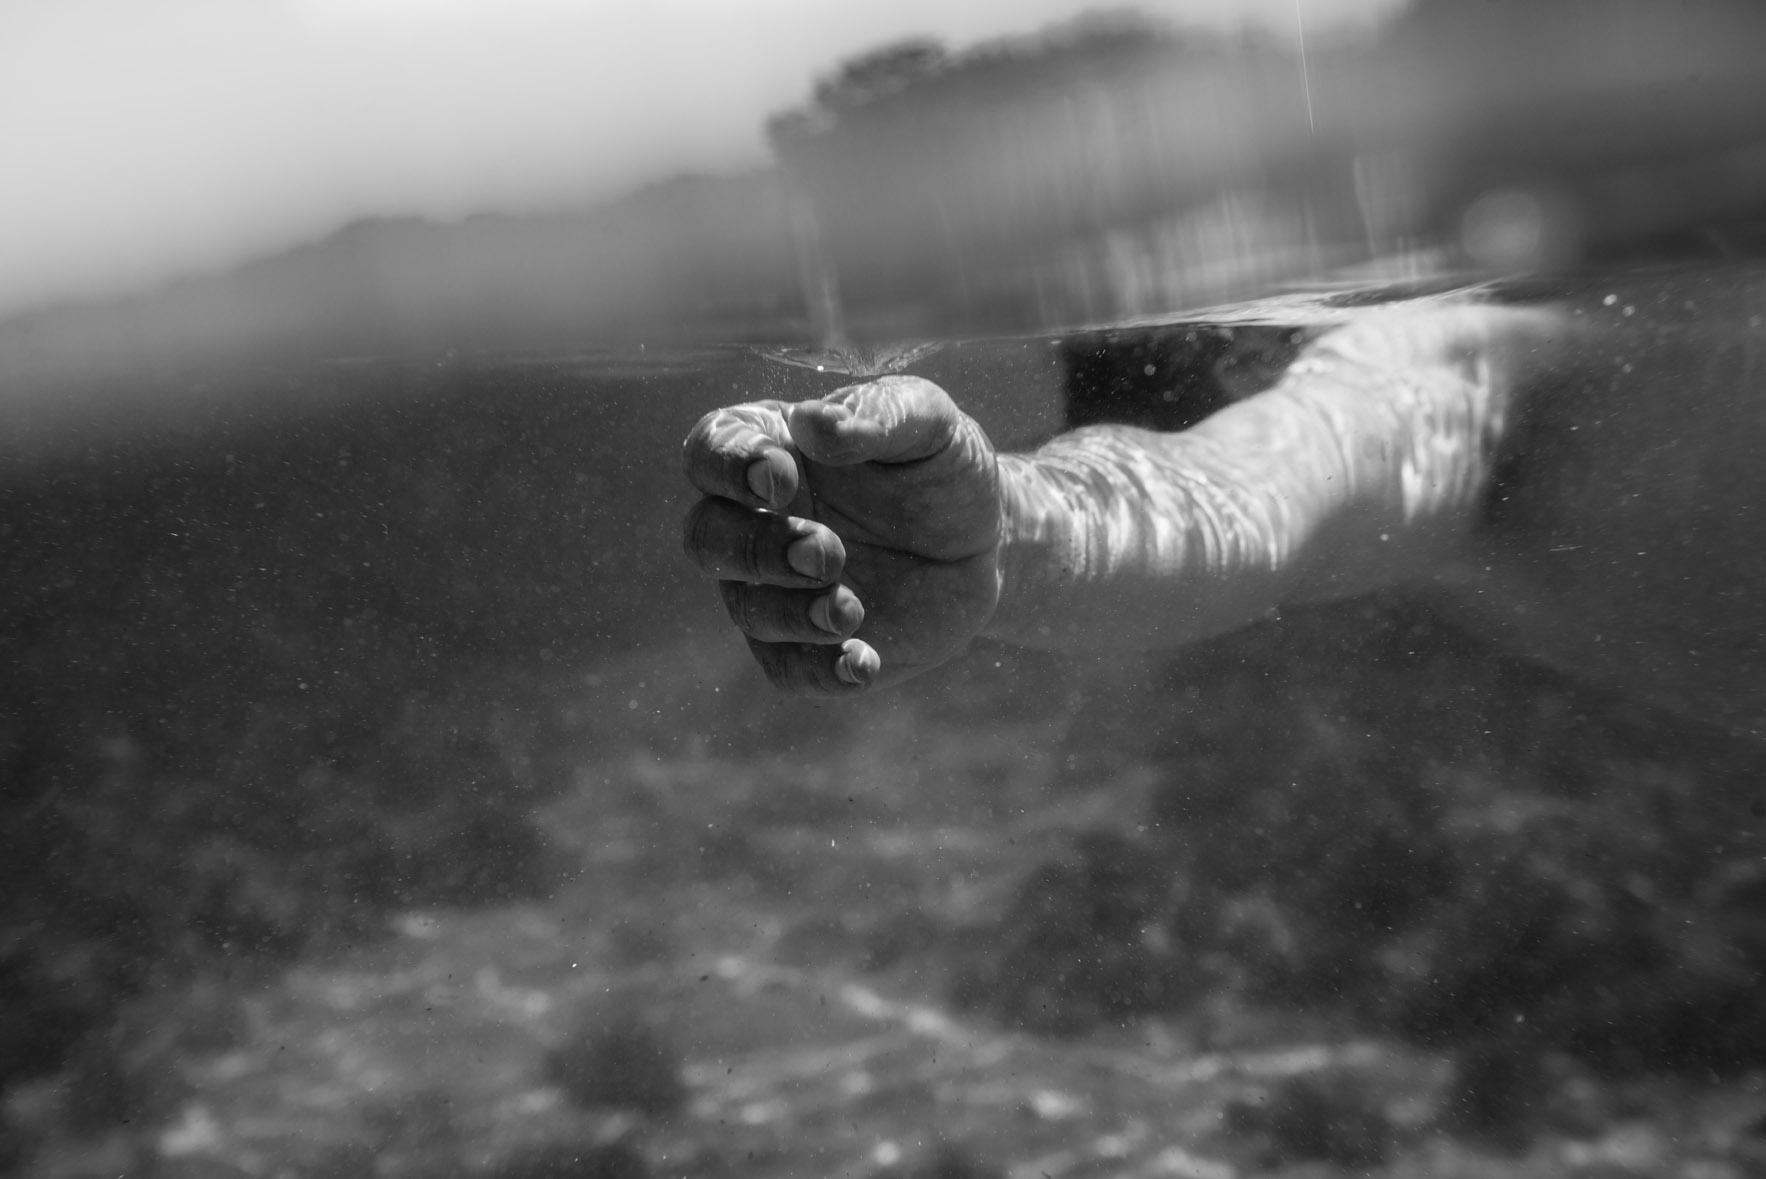 francesca-schmitt-photography-2